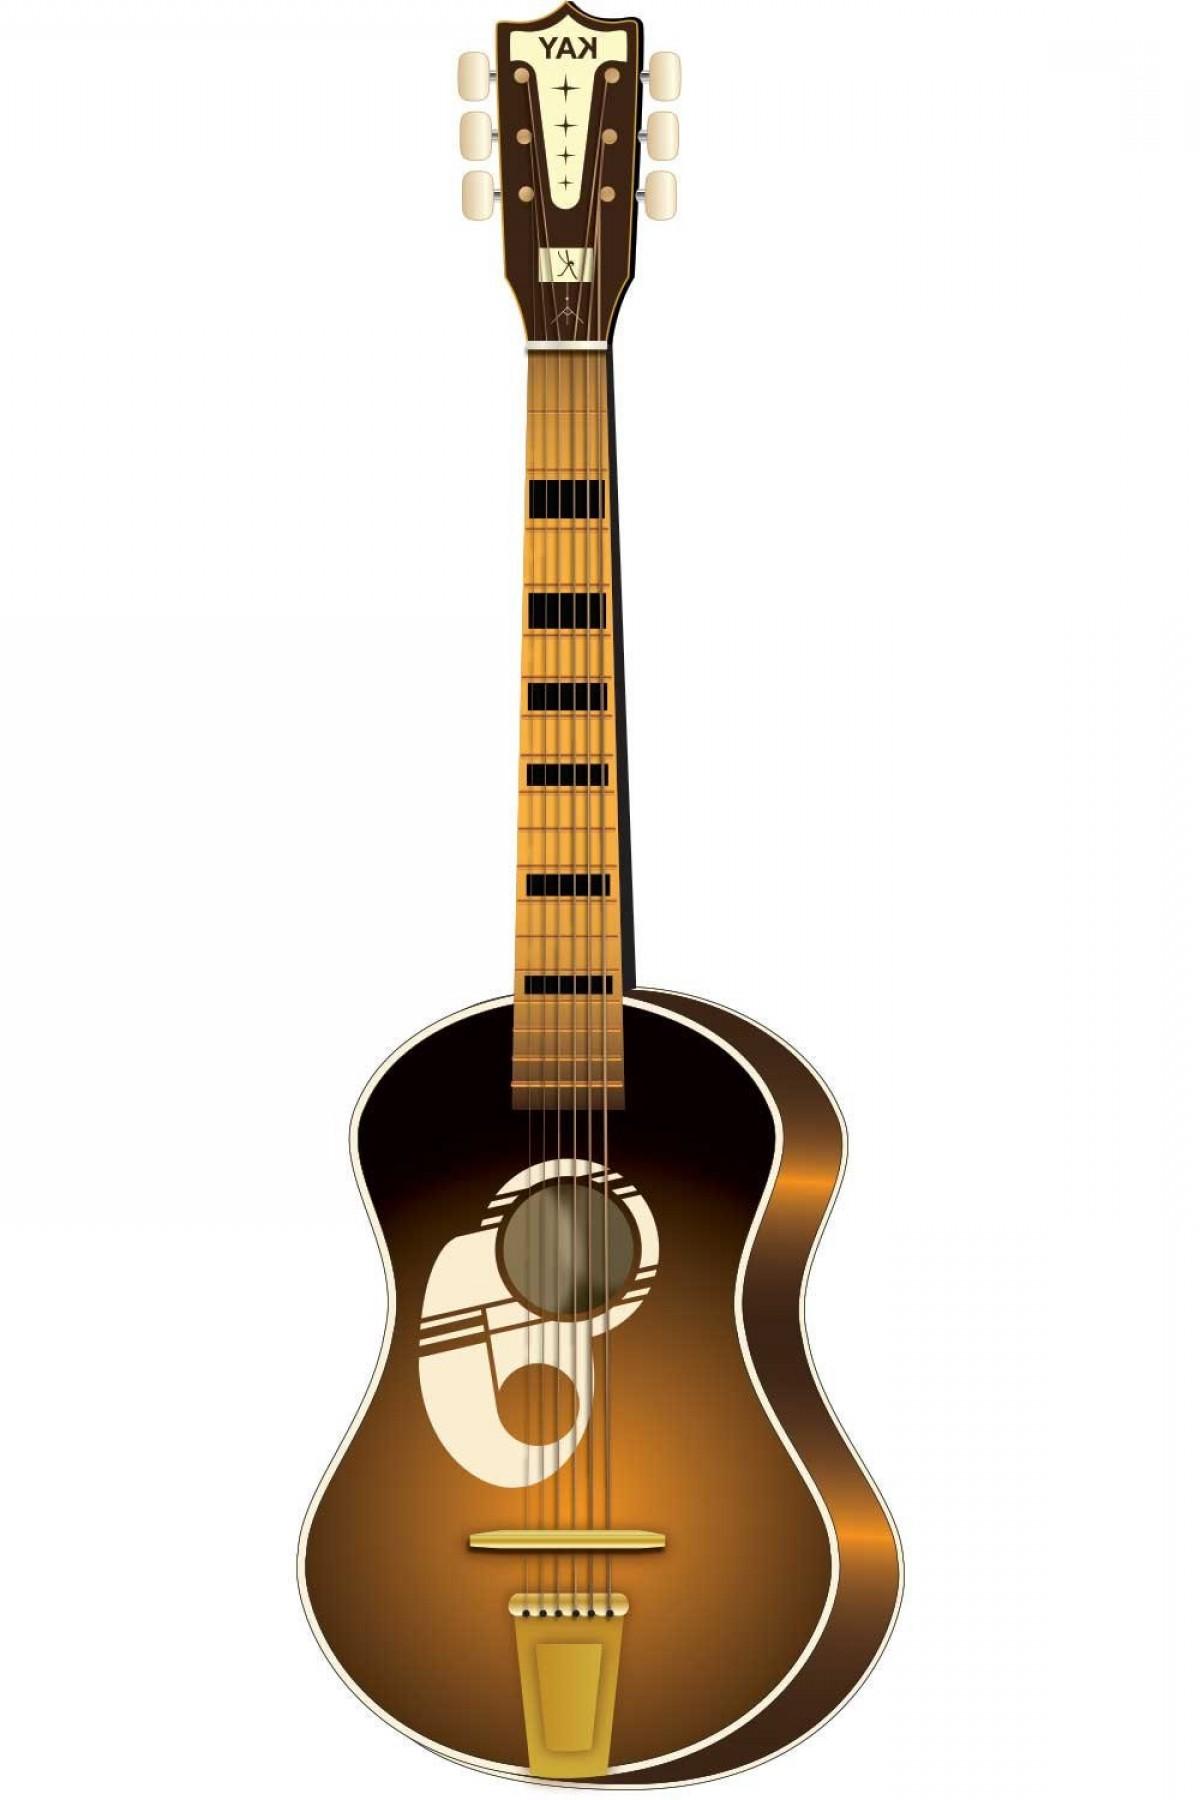 1200x1800 Vintage Guitar Clip Art Guitar Clip Art Geekchicpro